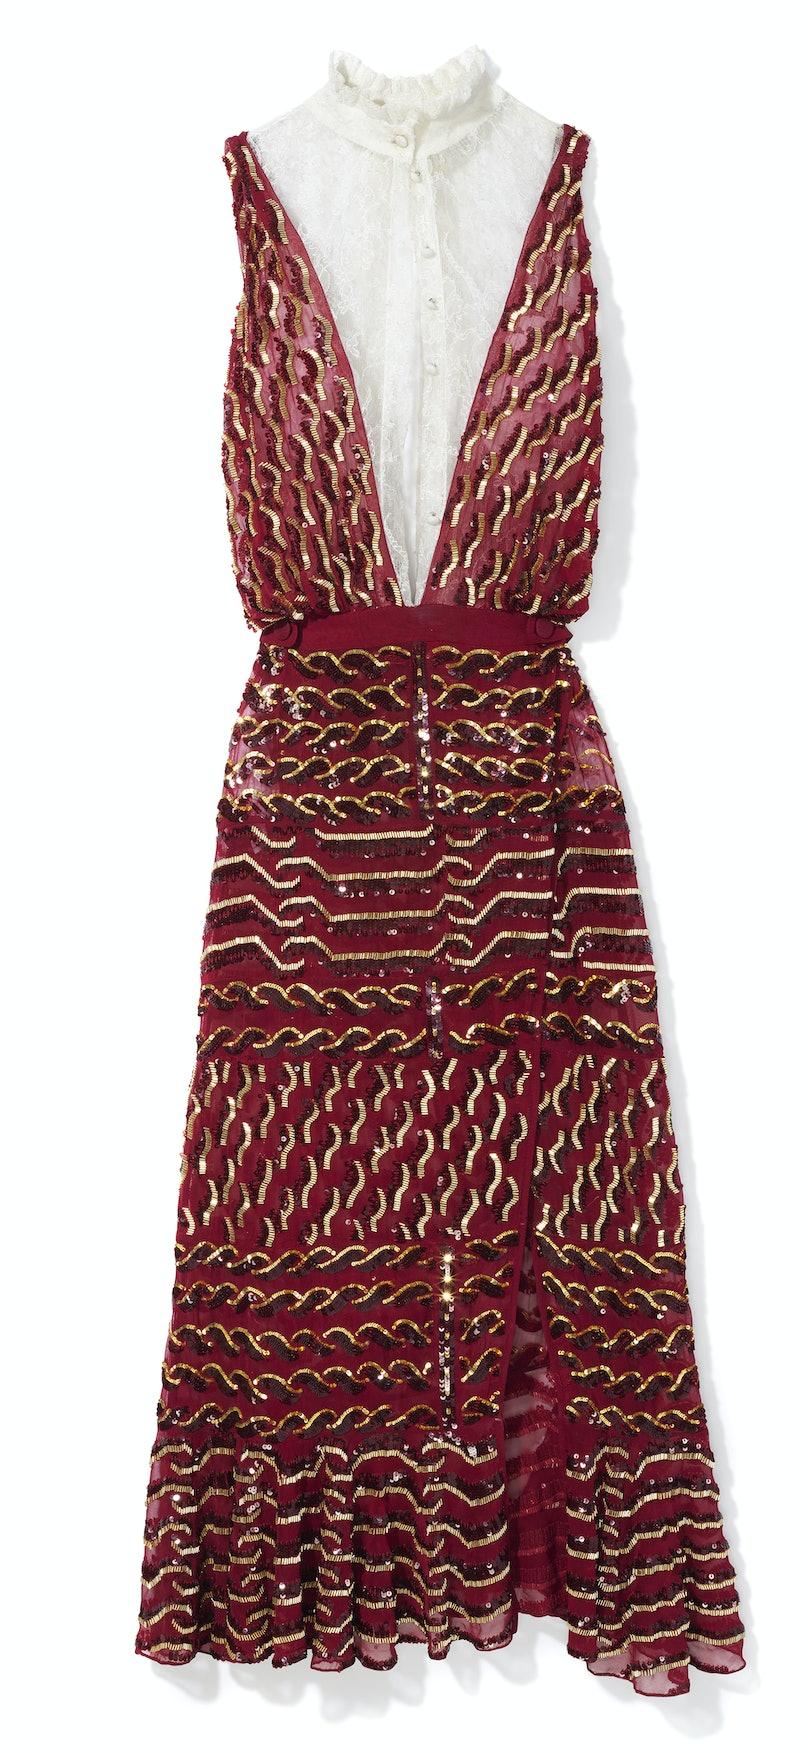 Altuzarra dress